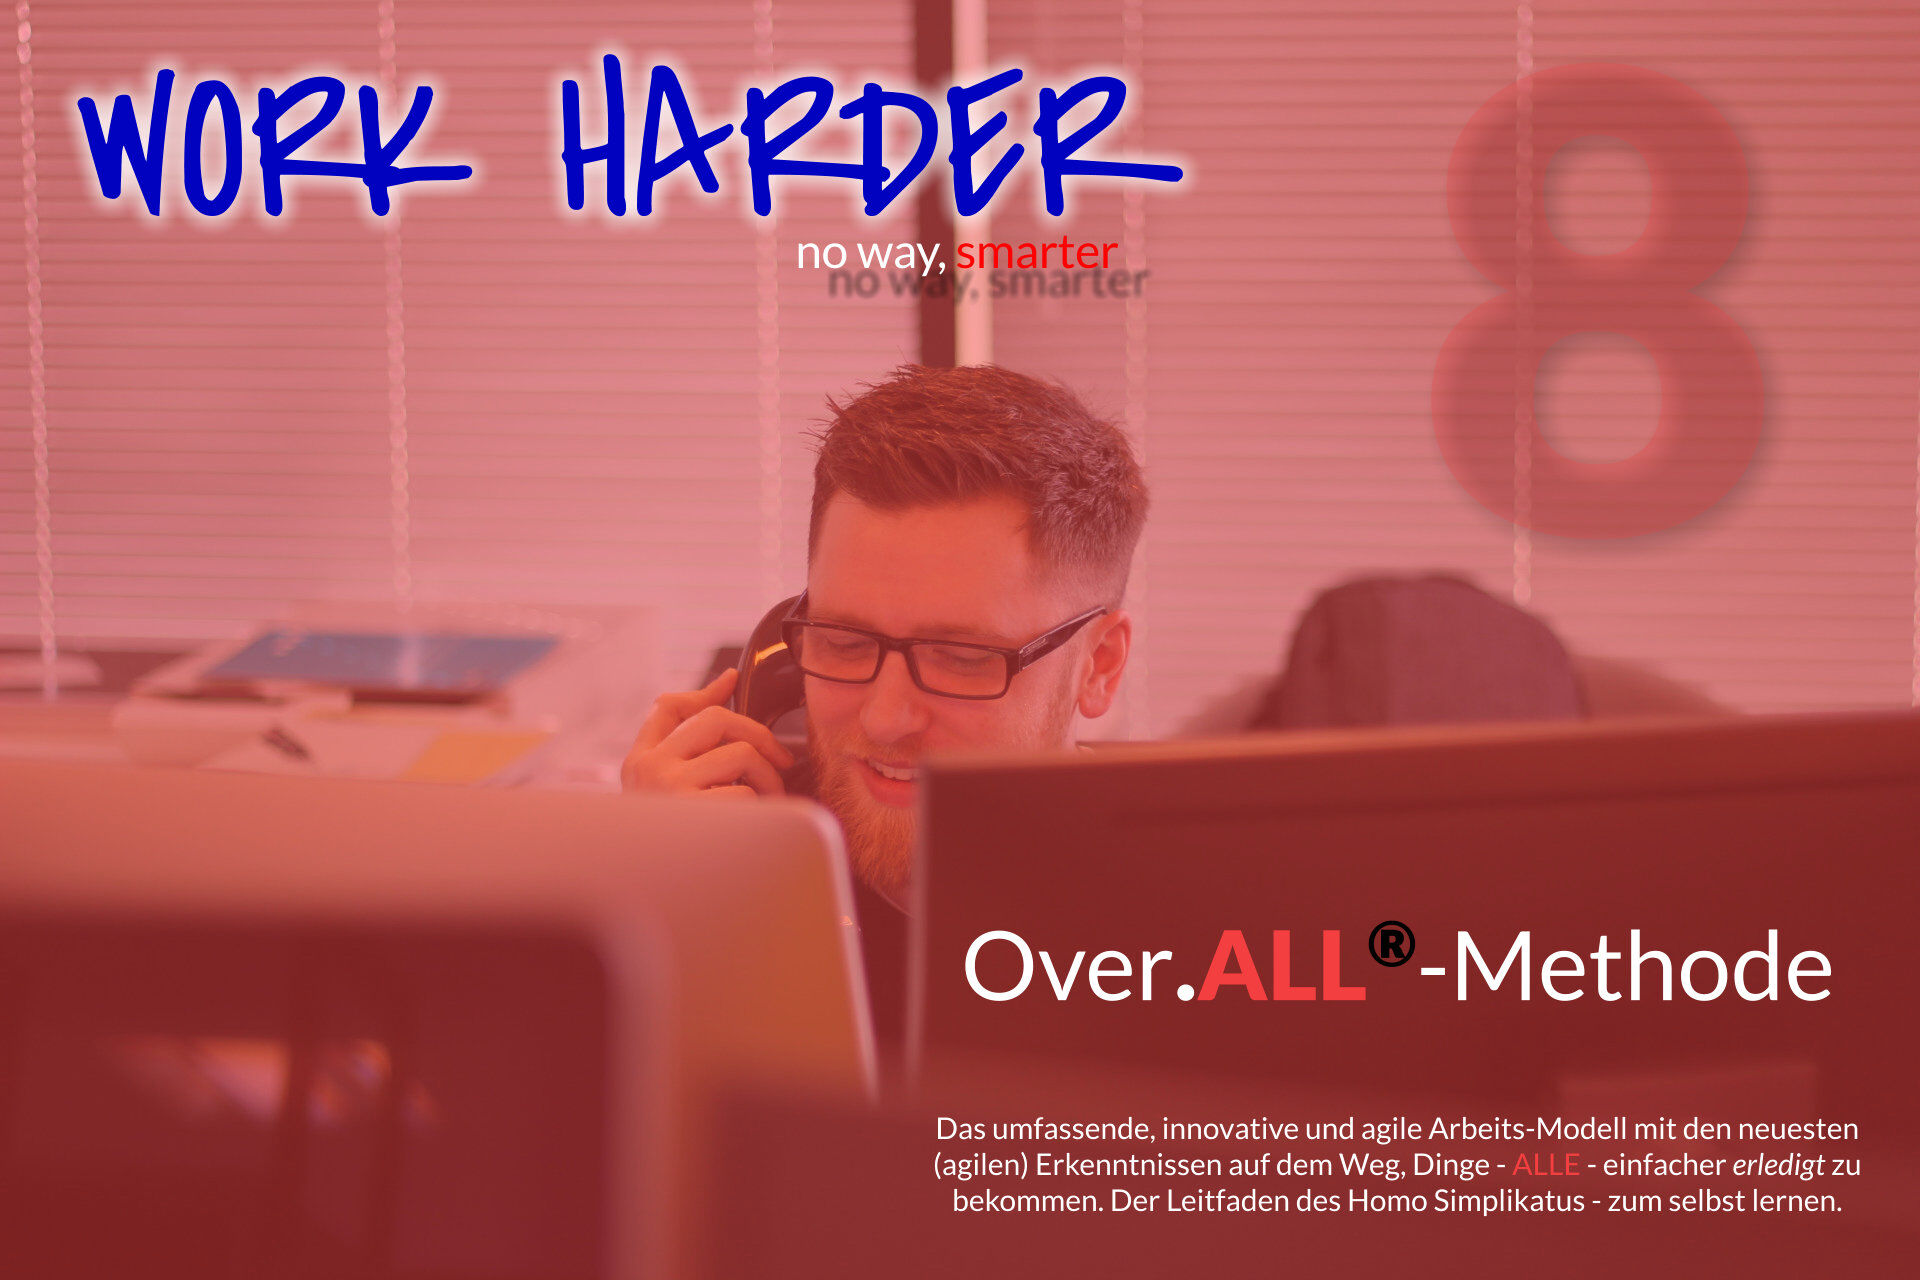 Work Harder Titel Series Over.ALL-Methode Blog Series Titel 08